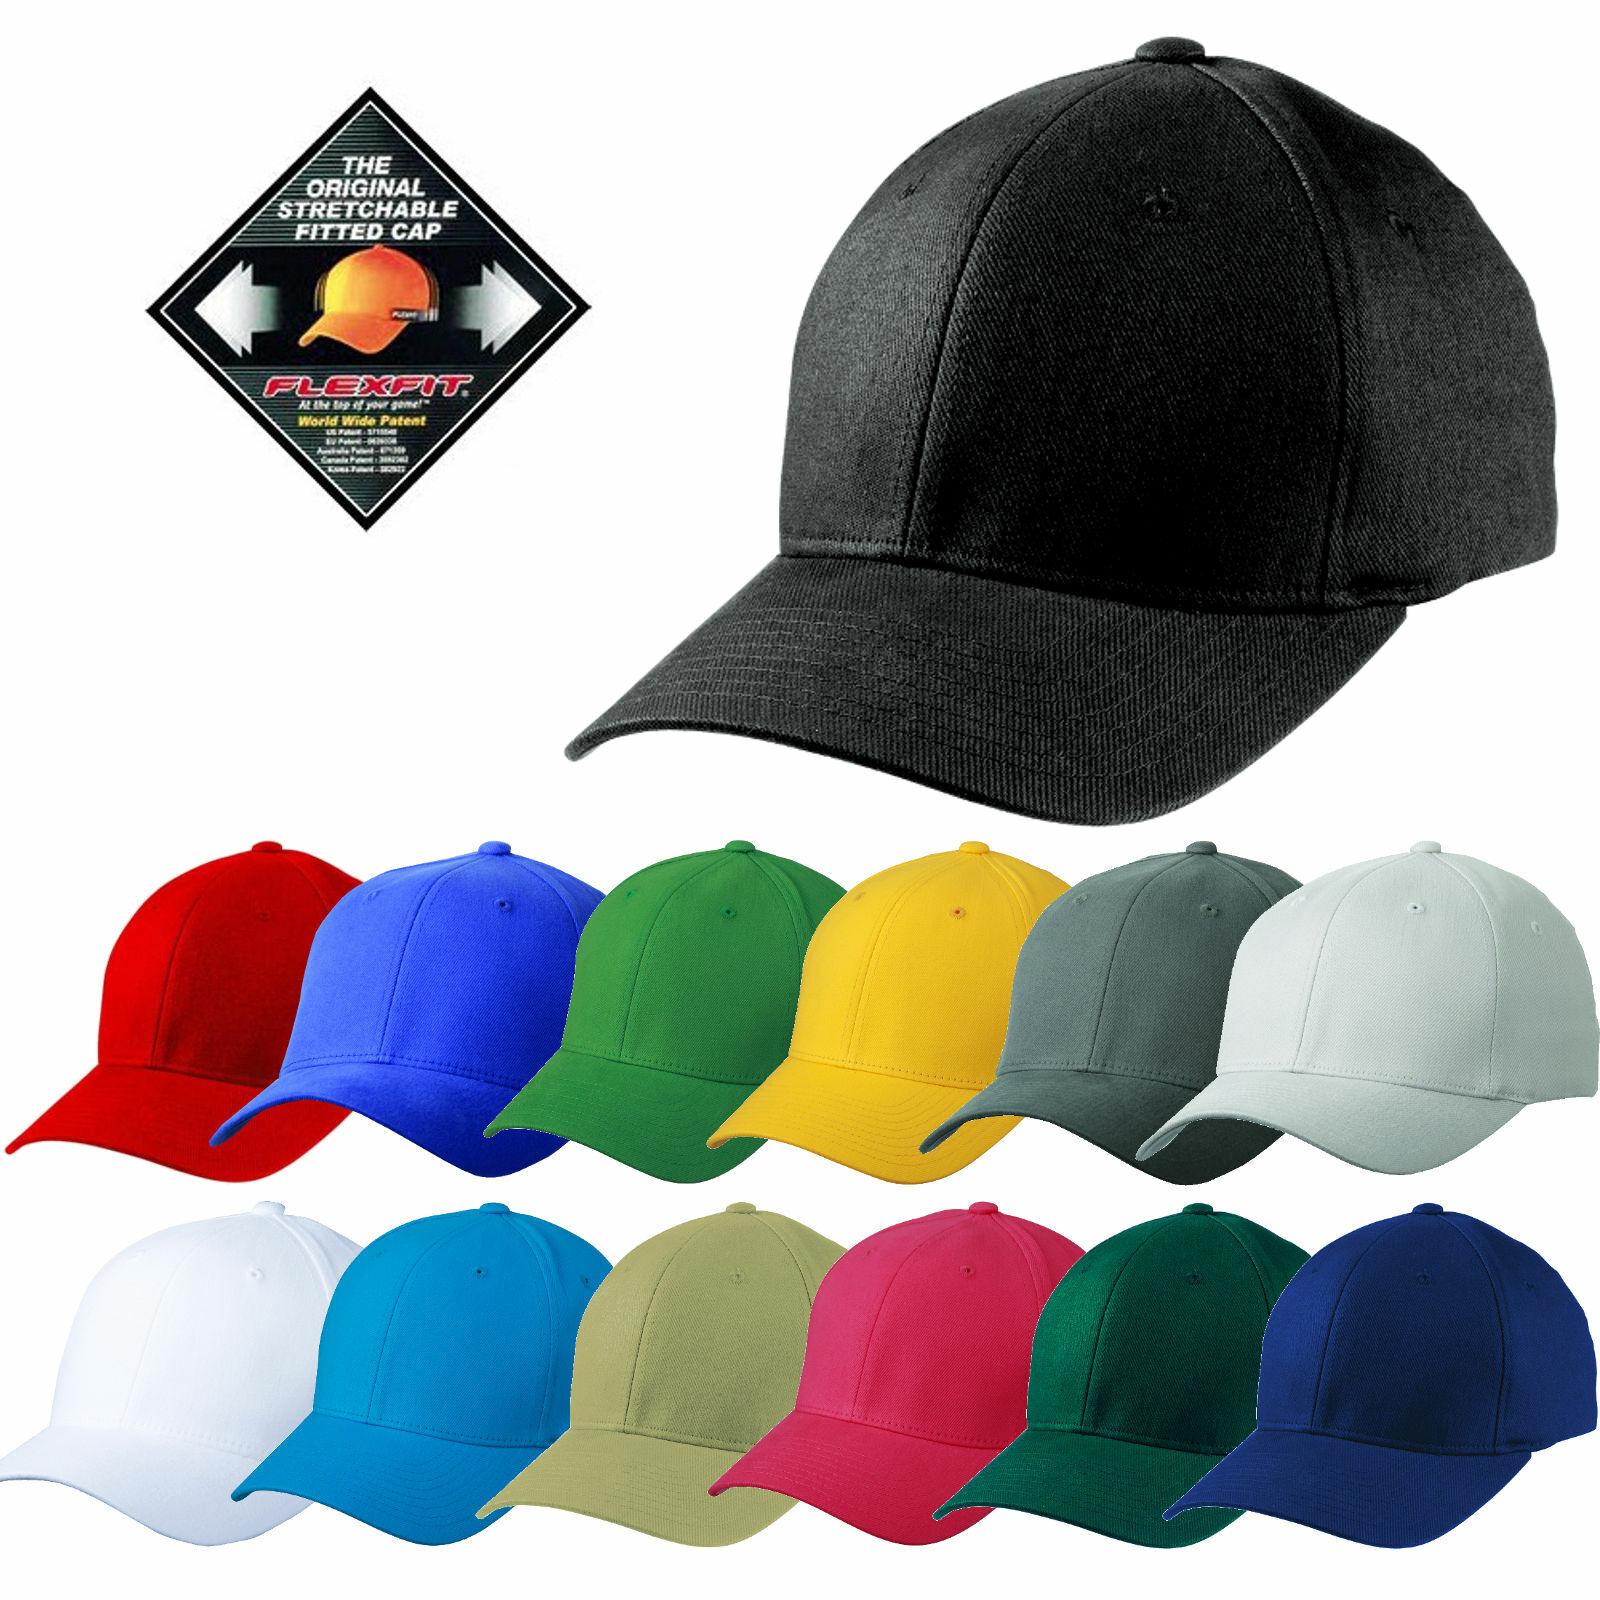 Flexfit Original Cap Flex Fit Basecap Baseball Caps Schirm Mütze Kappe Hut